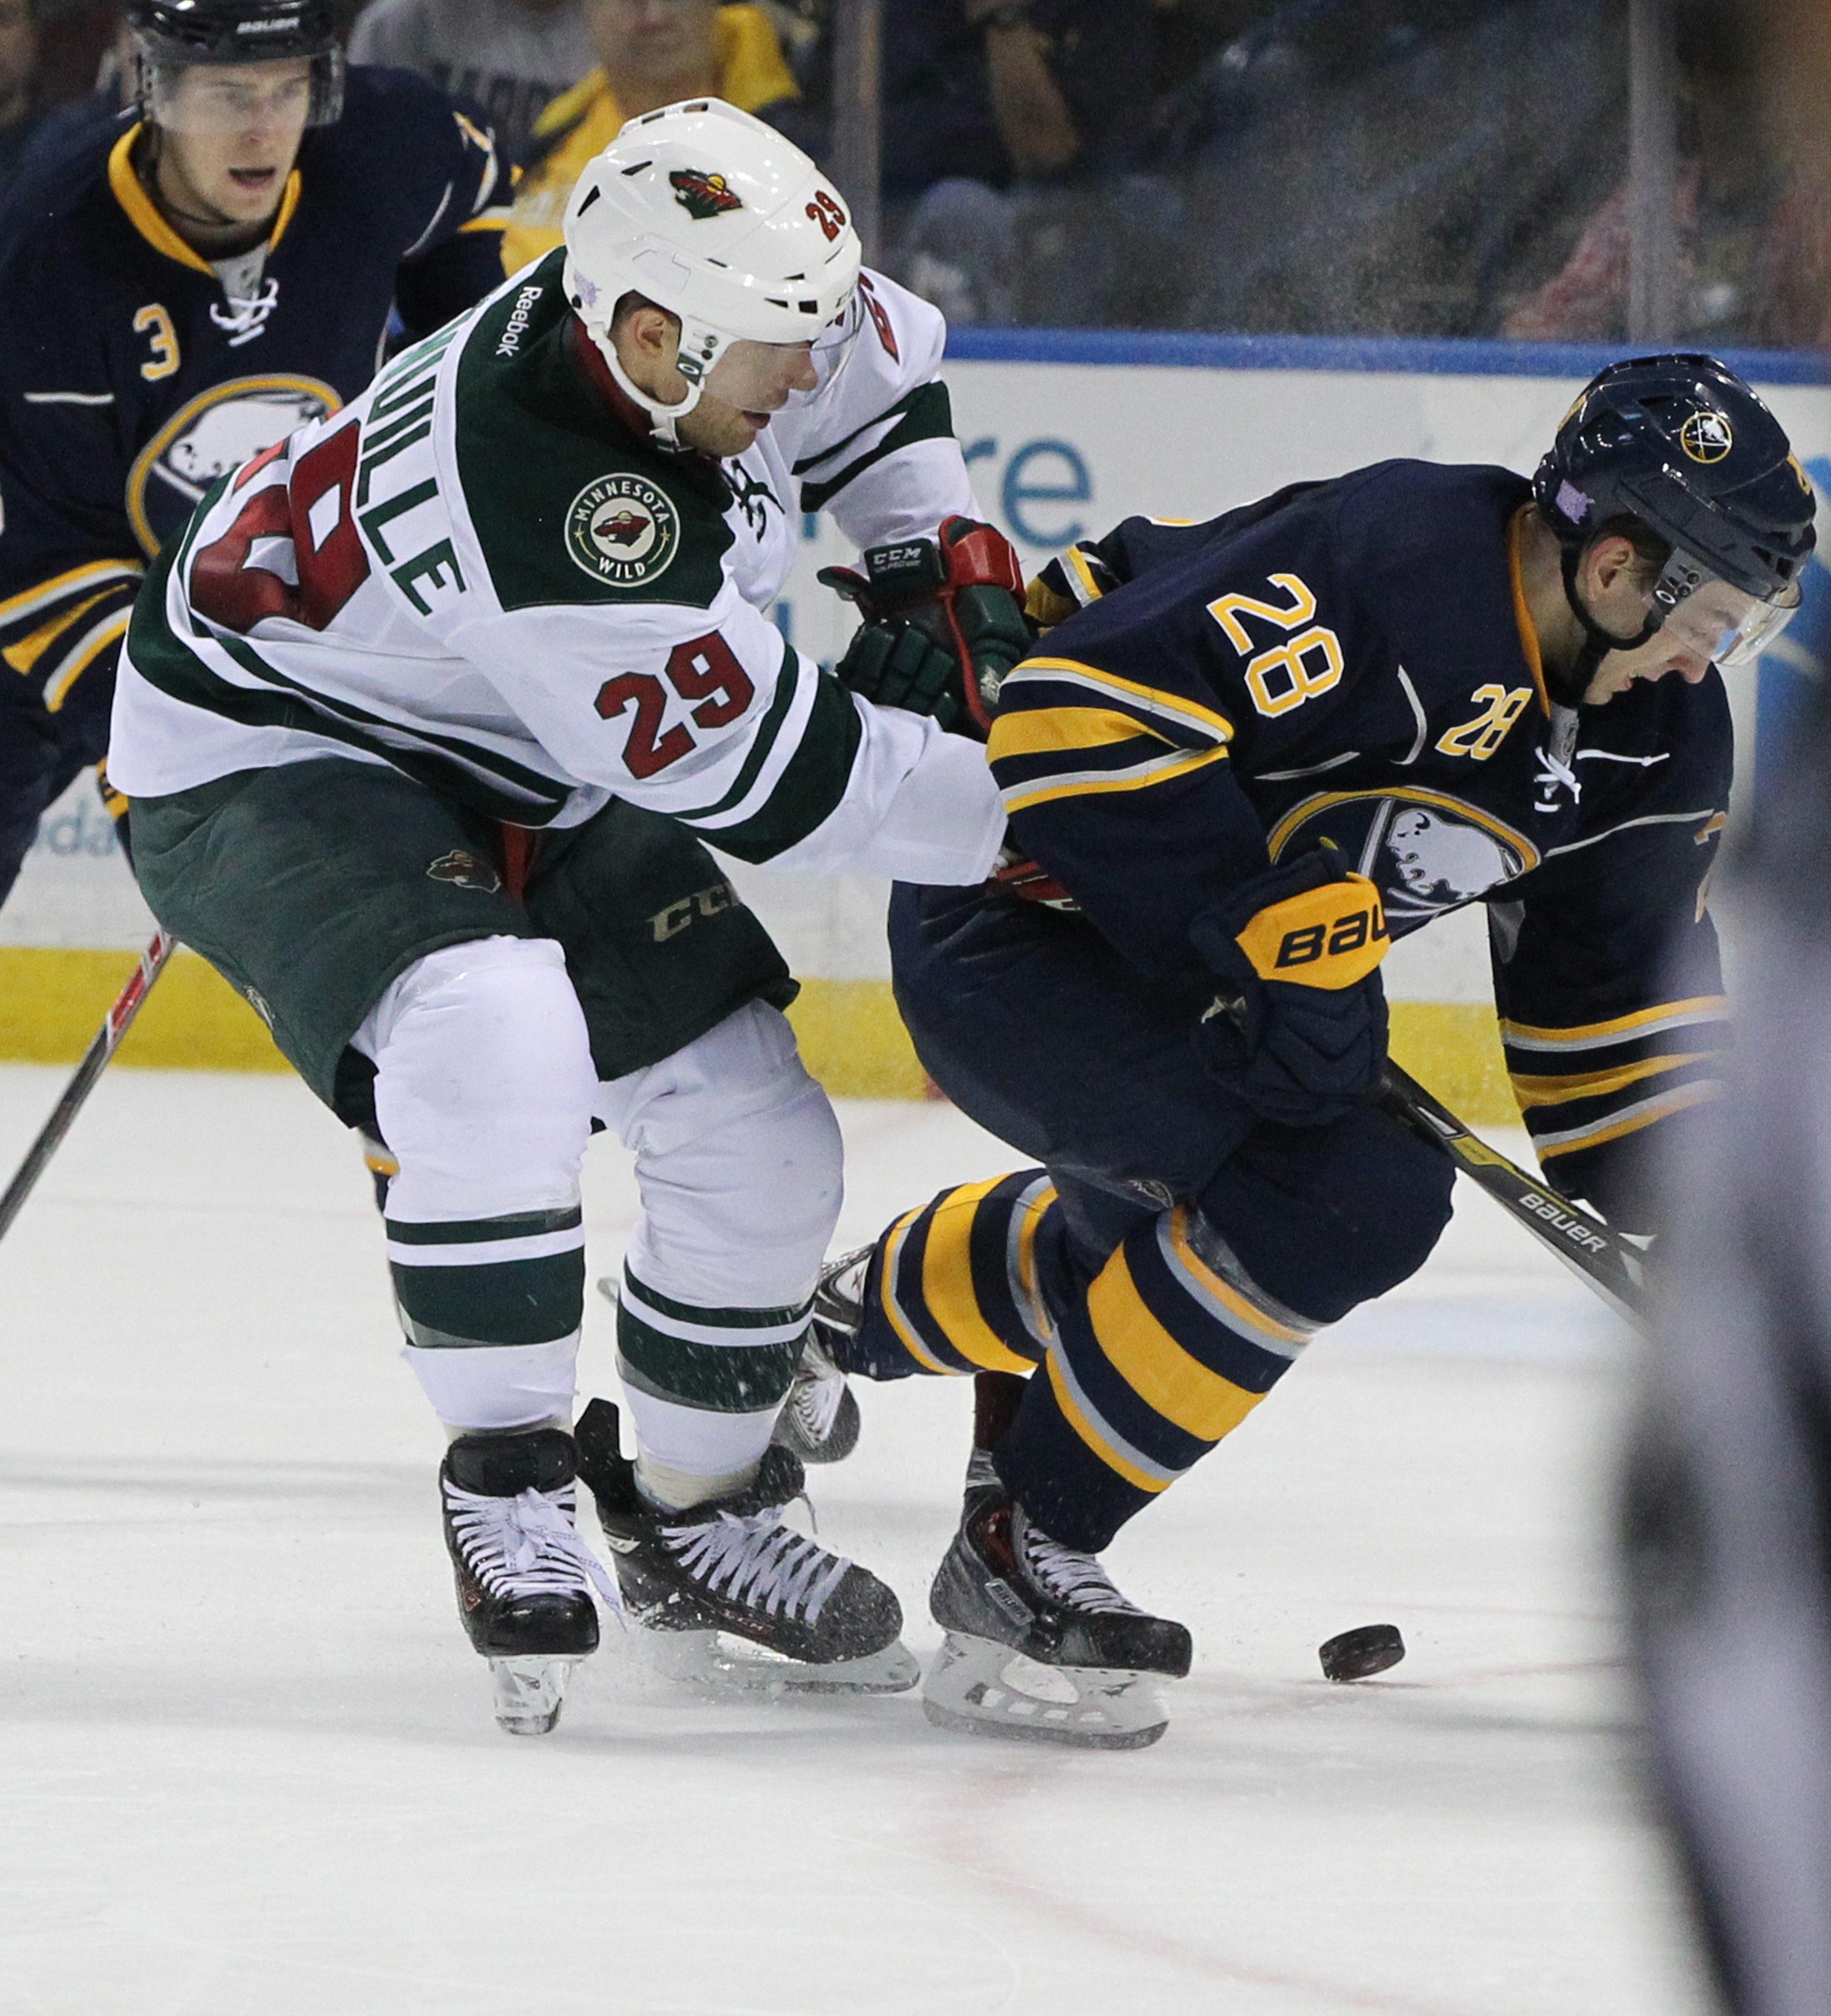 Ex-Sabres captain Jason Pominville of the Minnesota Wild checks Sabres rookie Zemgus Girgensons.  (James P. McCoy/ Buffalo News)